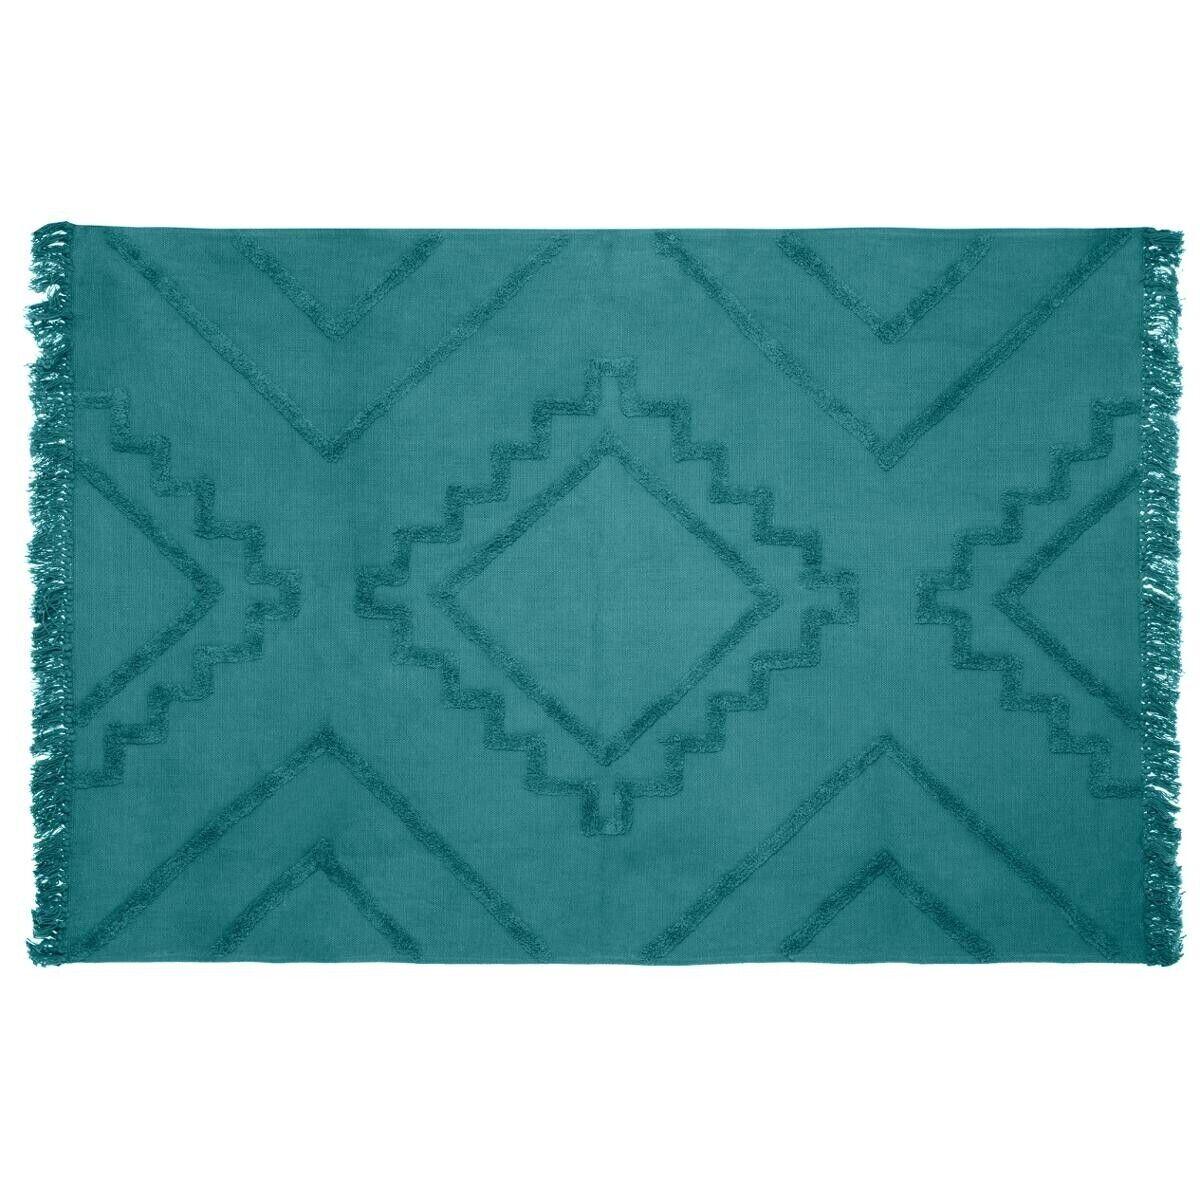 "Atmosphera Tapis en coton tufté ""Inca"" bleu 120x170 cm"